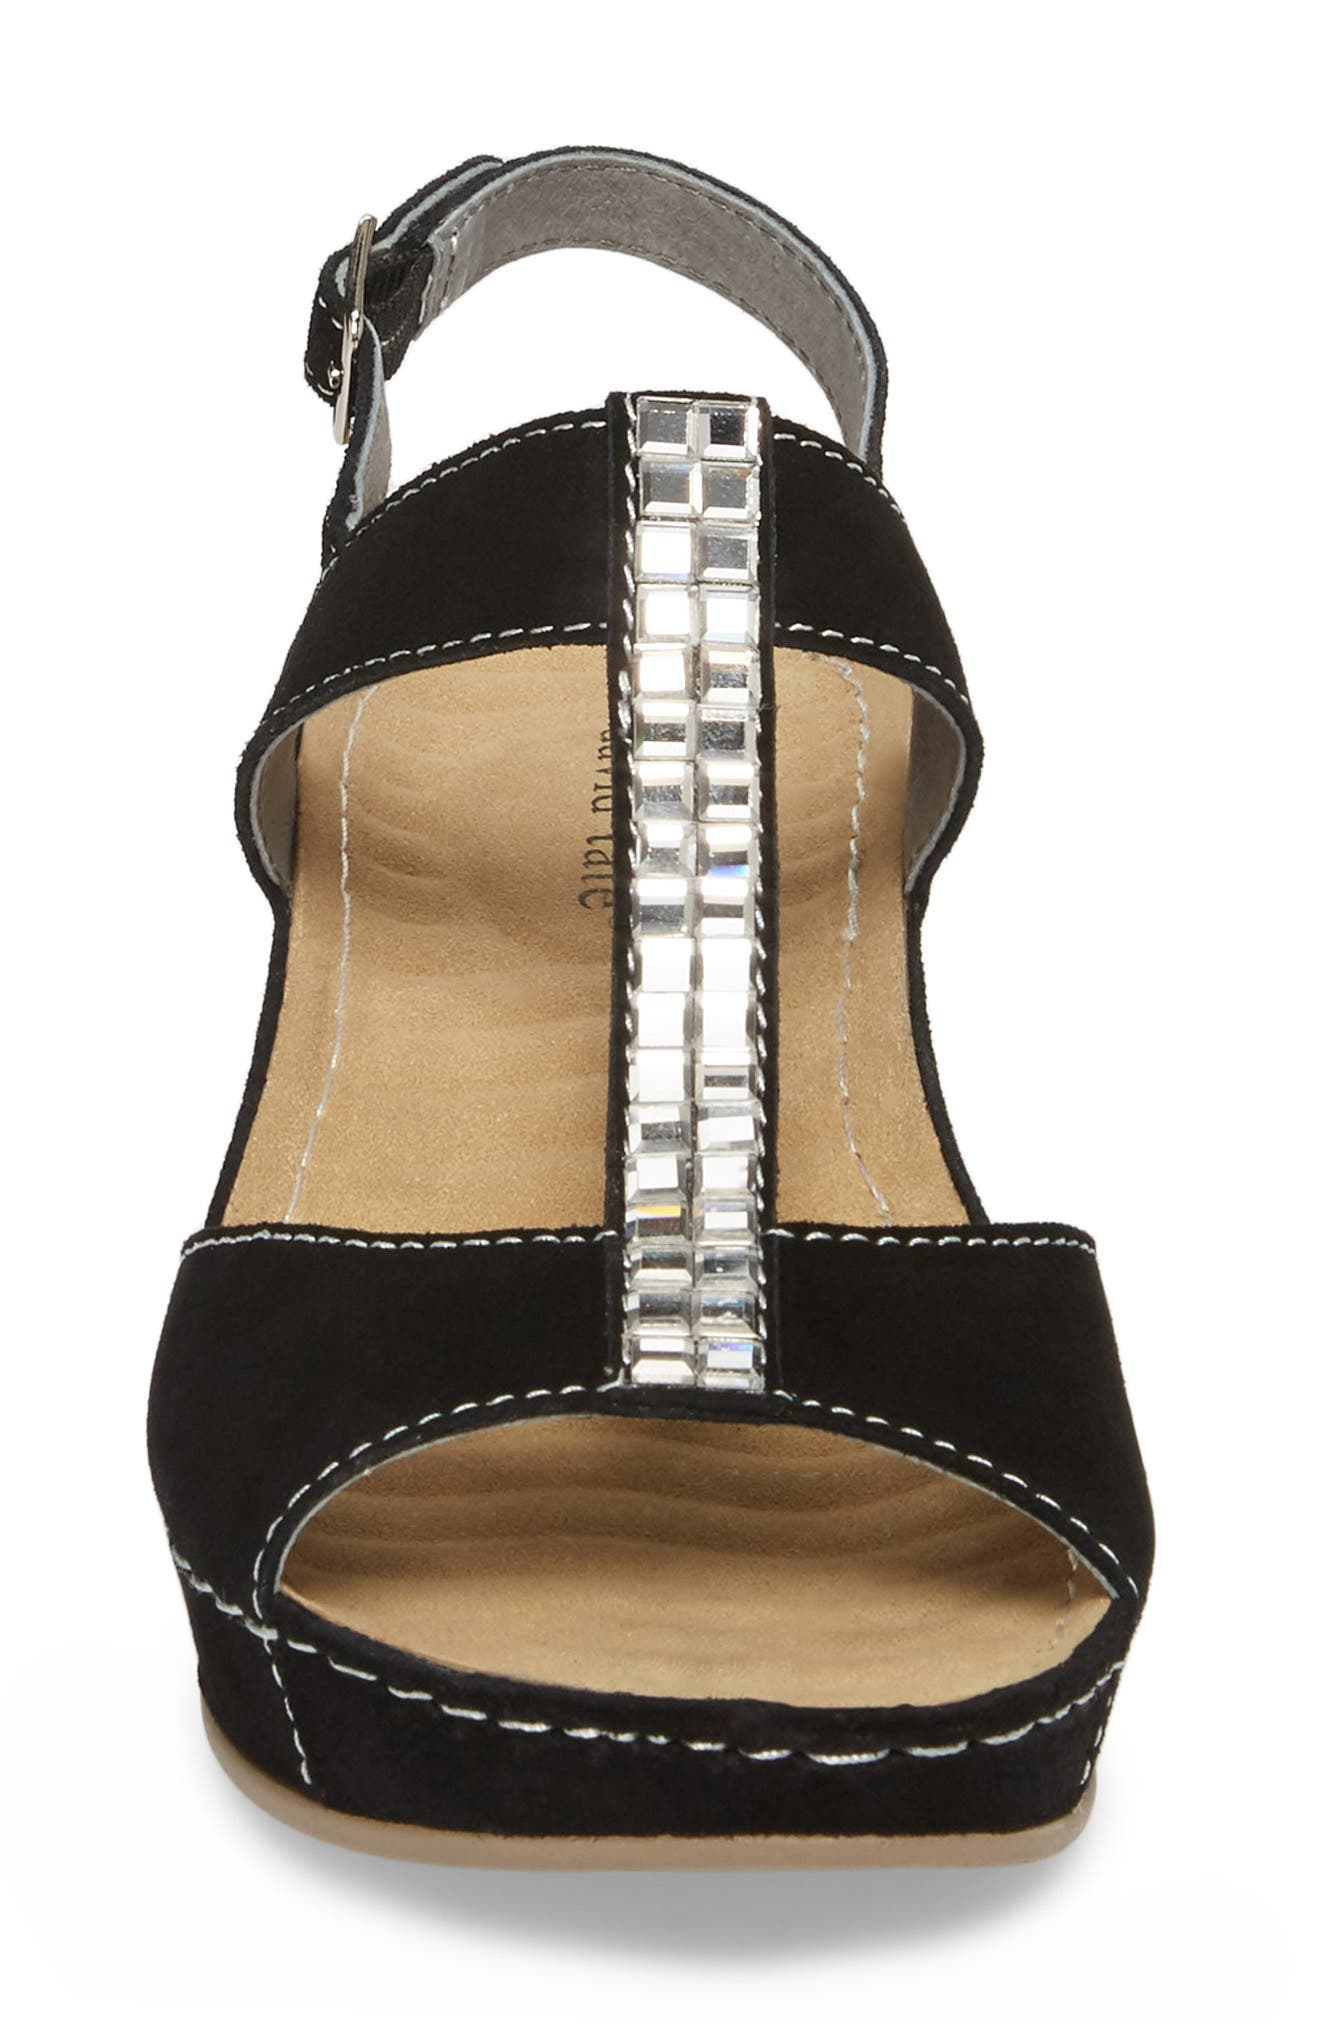 DAVID TATE, Bubbly Embellished T-Strap Wedge Sandal, Alternate thumbnail 4, color, BLACK SUEDE